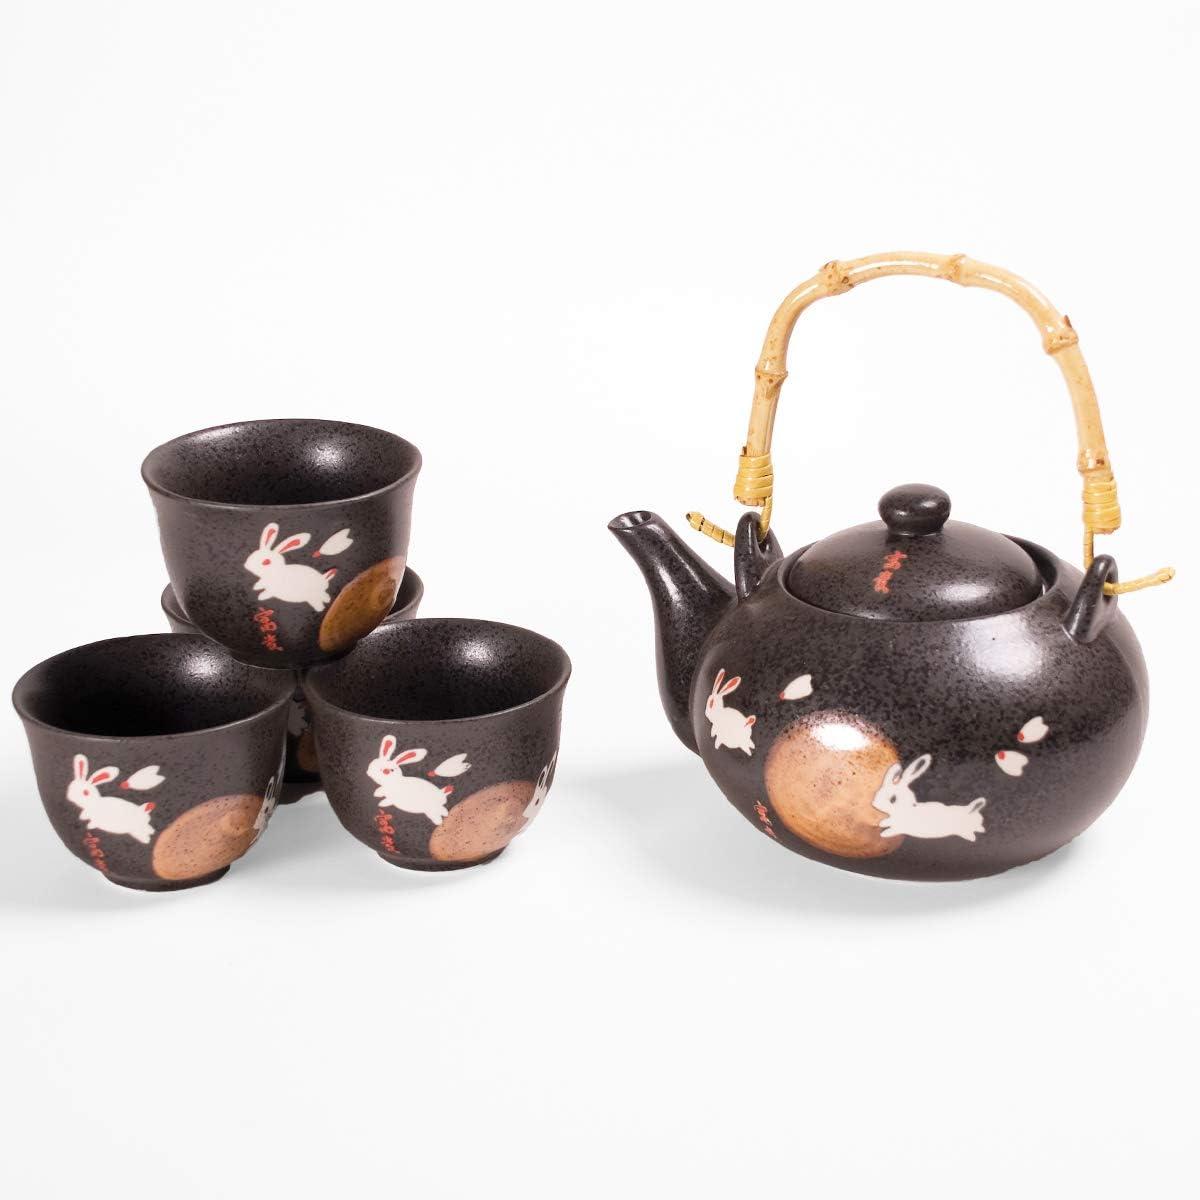 Hinomaru Collection Japanese Moon Rabbit Design Ceramic 20 fl oz Tea Pot and 4 Cups Tea Set Asian Home Decor